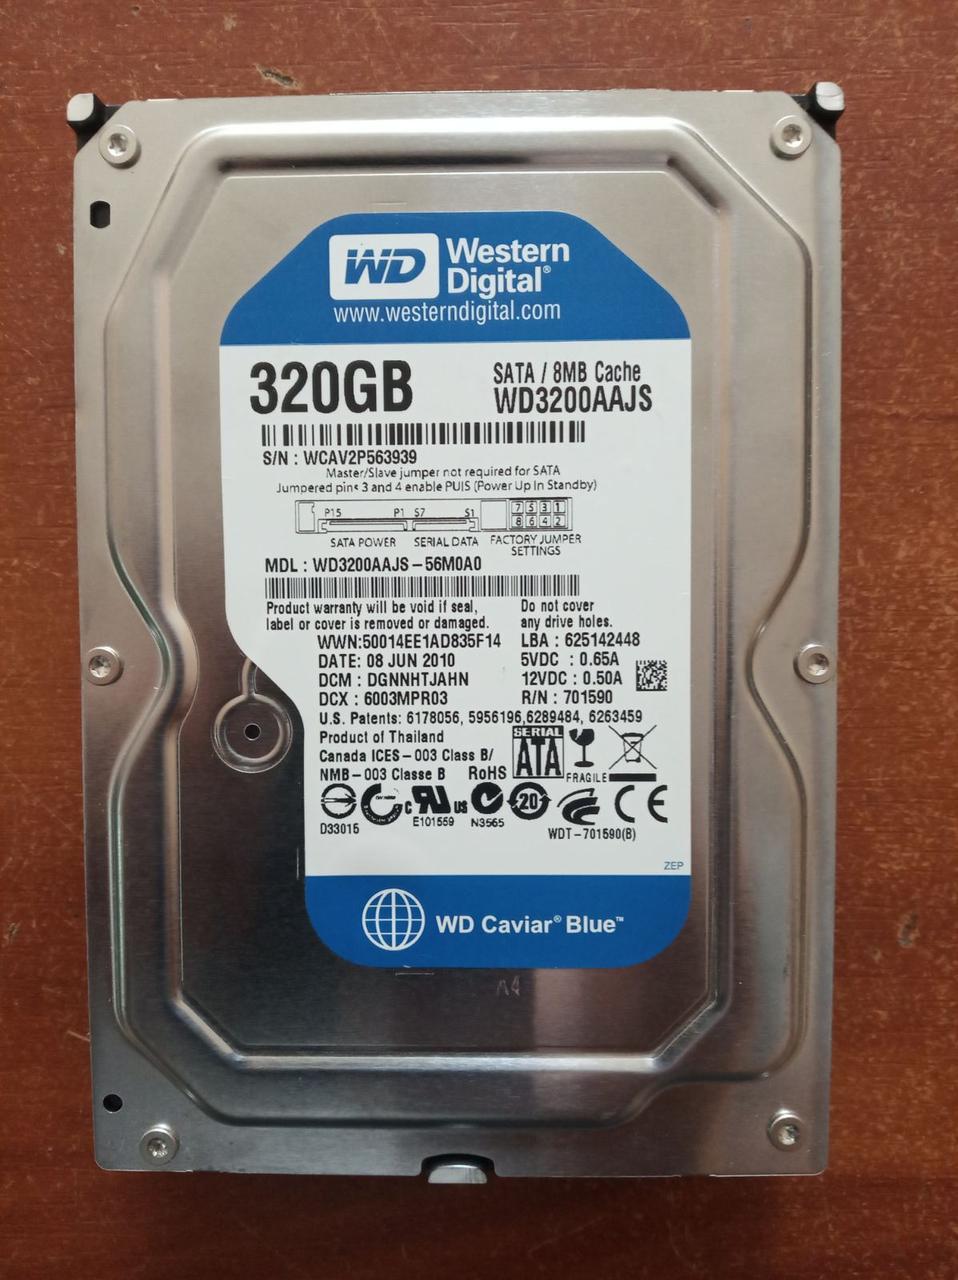 "Жесткий диск HDD Western Digital Caviar Blue 320GB 8MB 7200RPM 3,5 "" (WD3200AAJS) состояние отличное"